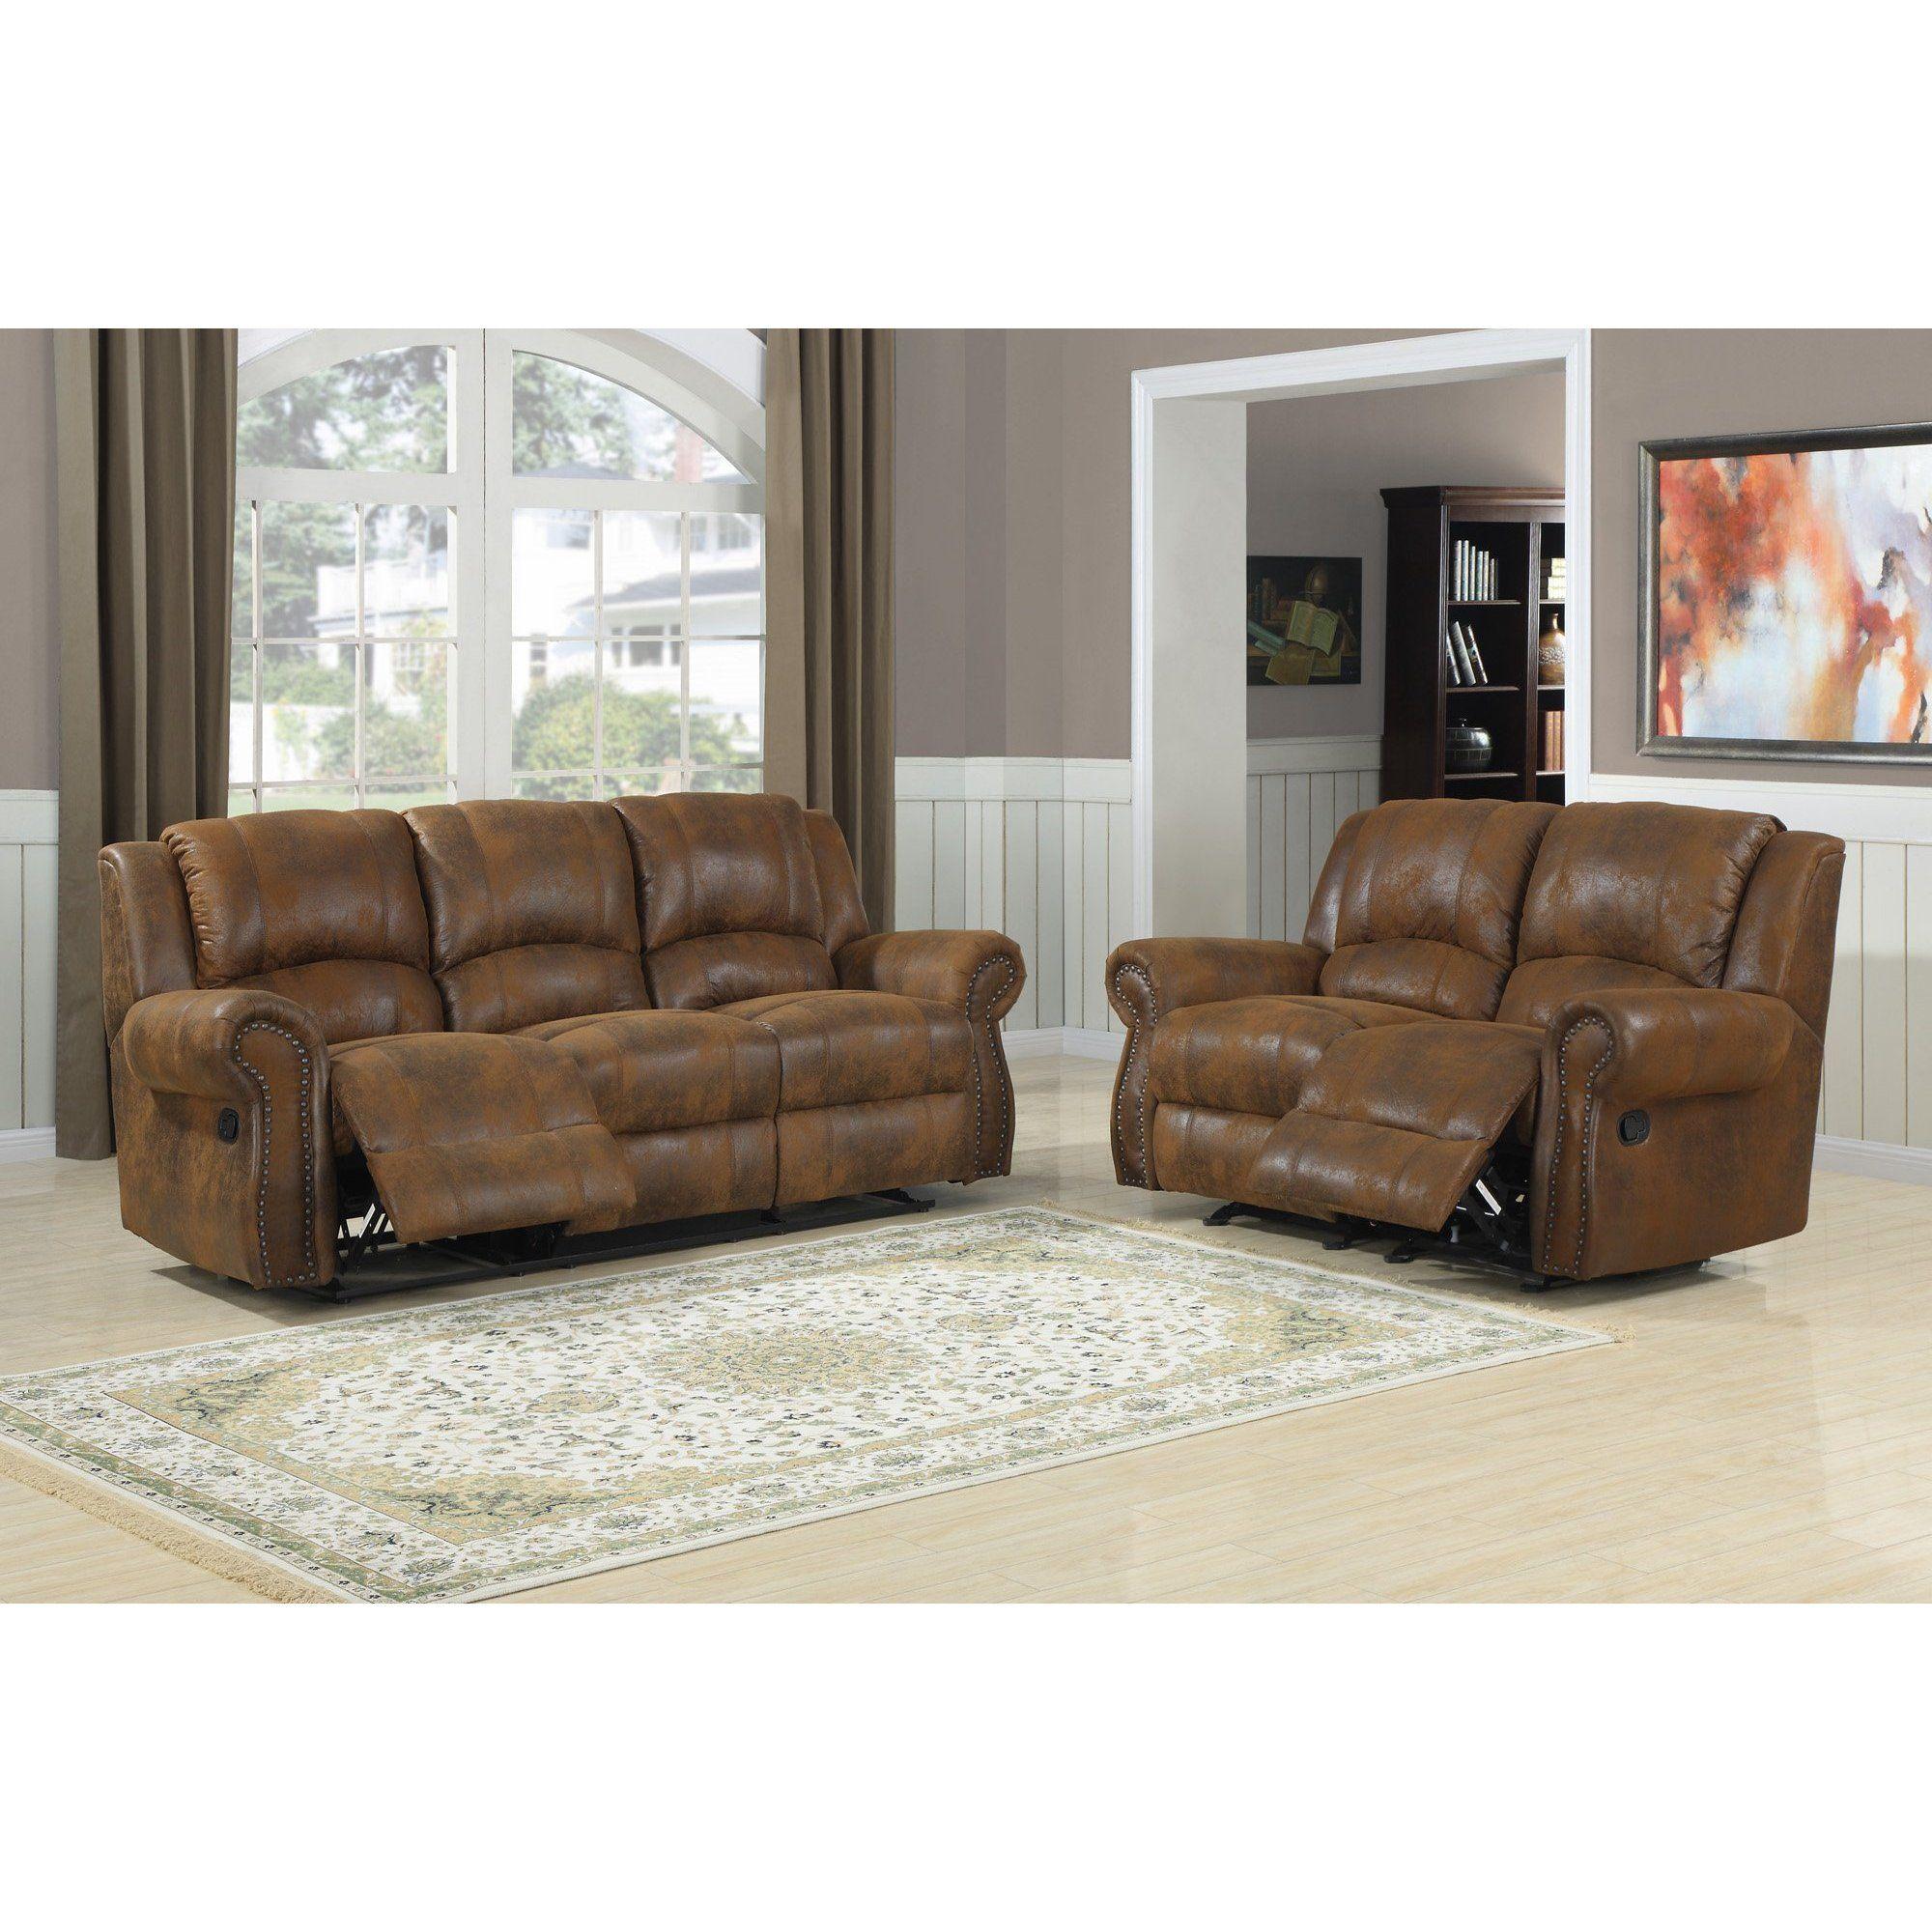 FurnitureMaxx Quinn Double Reclining Sofa , Bomber Jacket ...